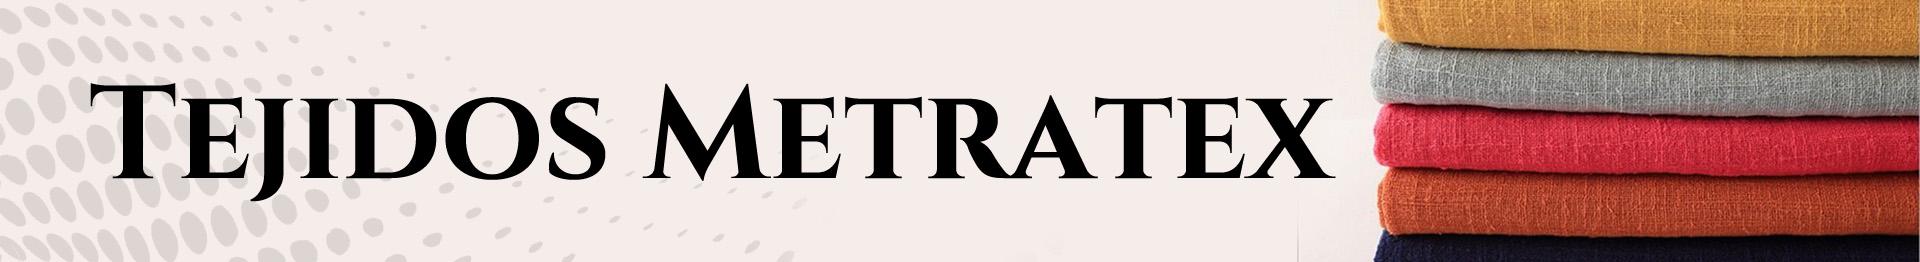 Tejidos Metratex - cabecera